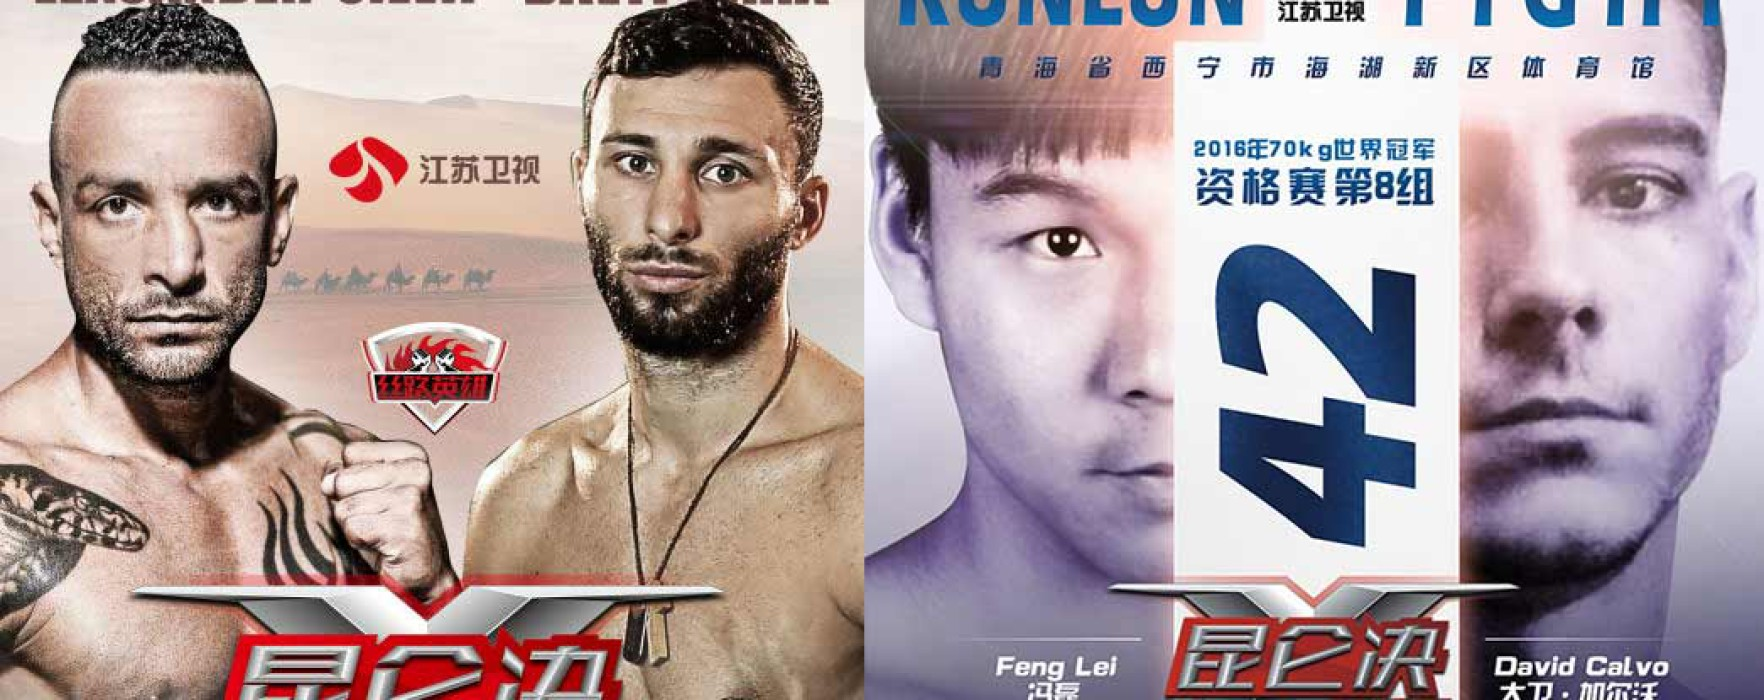 Video streaming: Kunlun Fight 41 – 42 featuring Saiyok Pumpanmuang, Davit Kiria, Alim Nabyiev, Diogo Calado etc – 8/9 April 2016